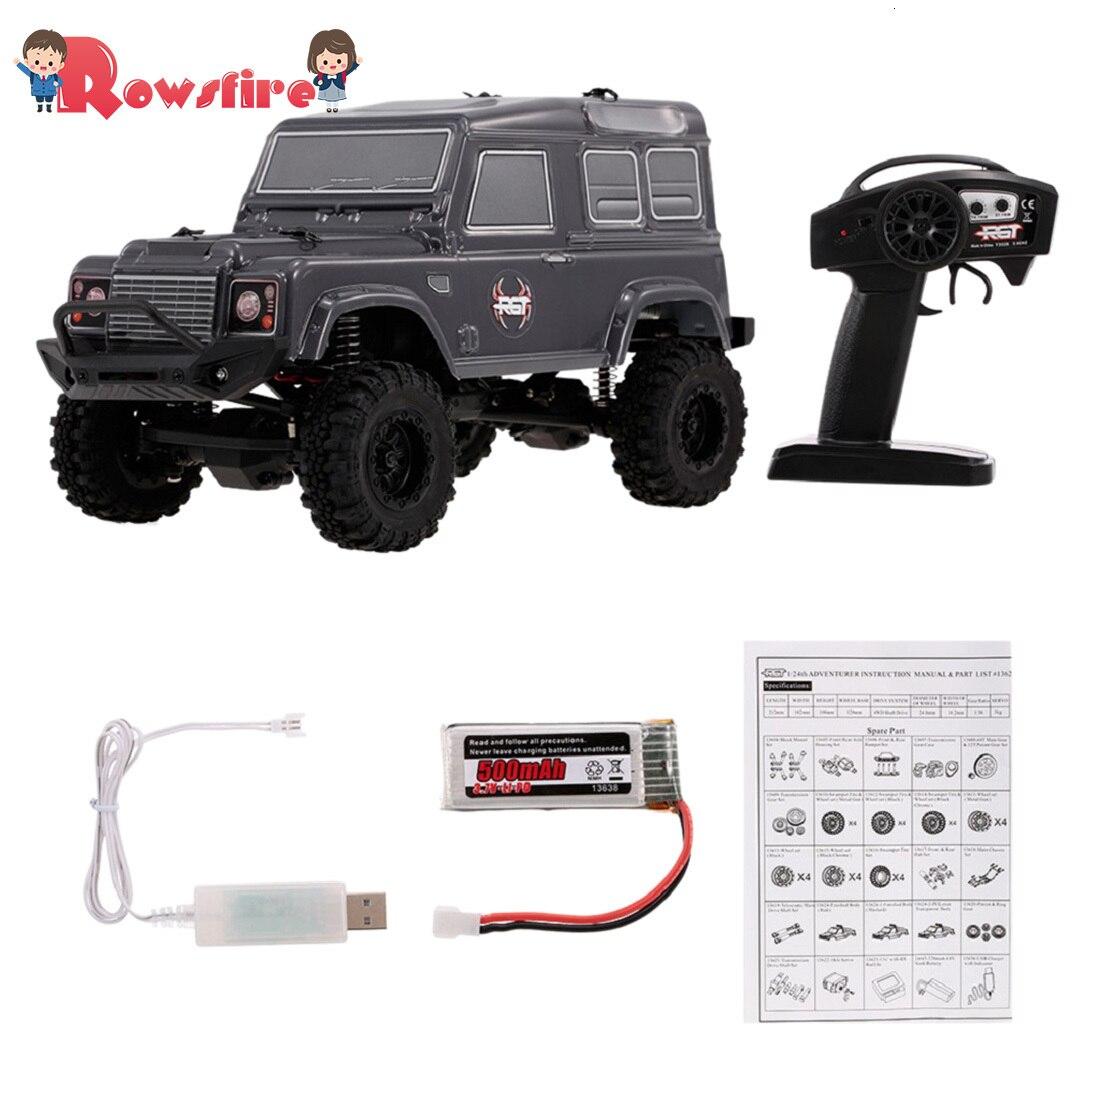 Rowsfire 1 Pcs RGT 1:24 2.4G 4WD 15km/H Simulation RC Off-Road Crawler Vehicle Climbing Car RTR Version - Grey/Silver